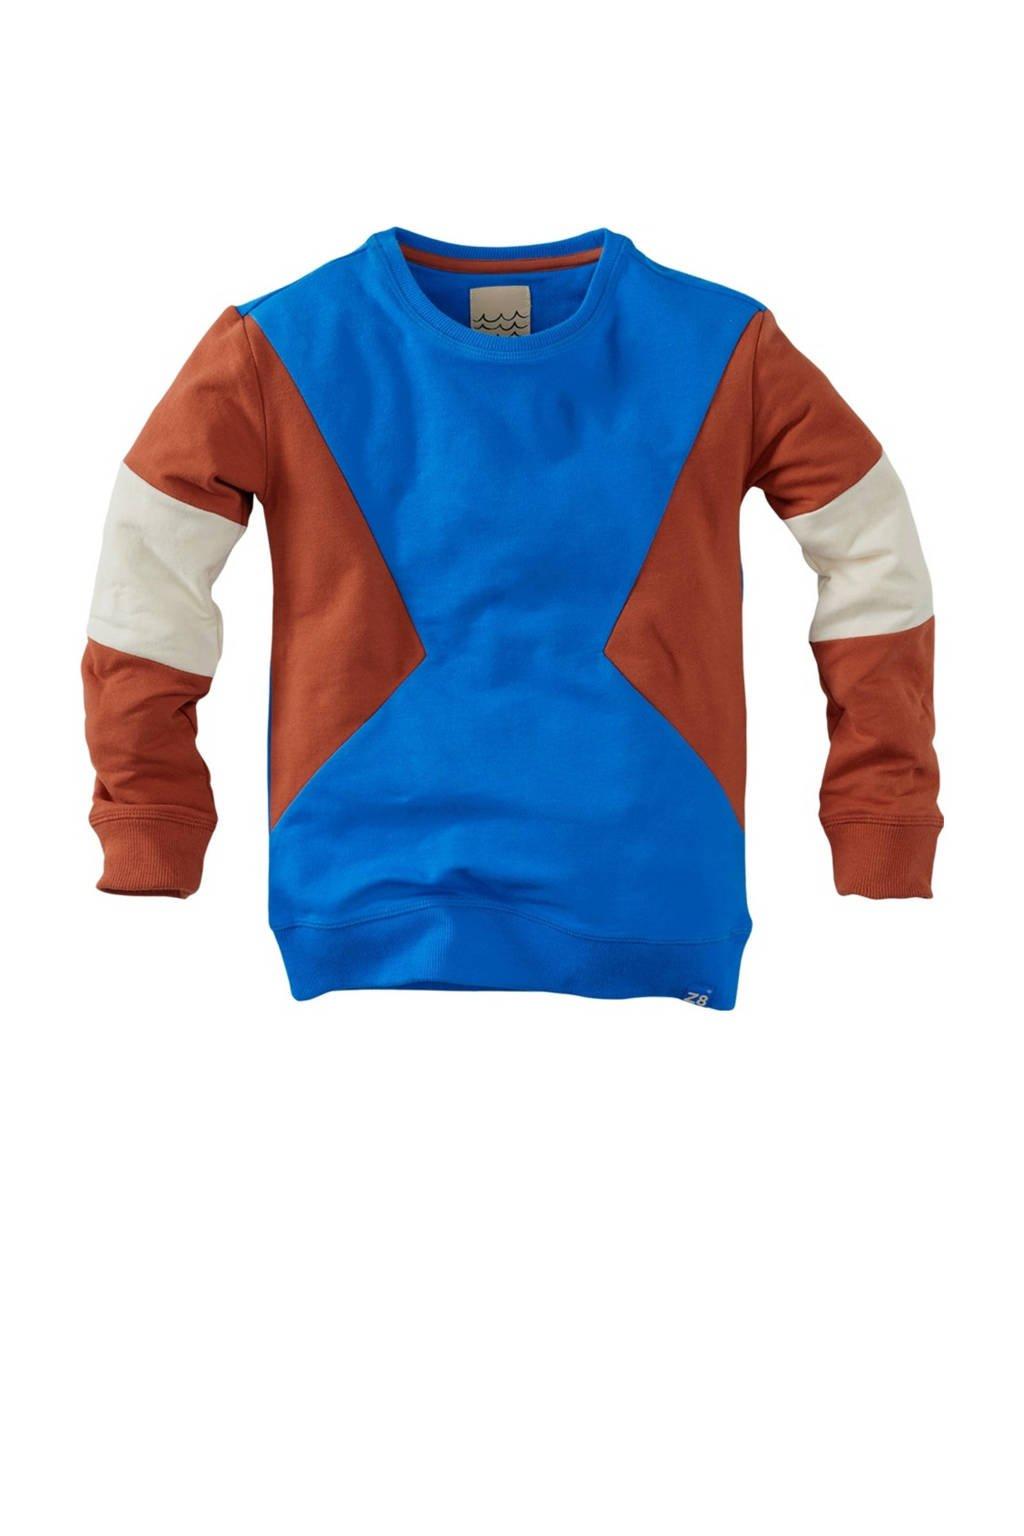 Z8 sweater Nico S21 blauw/bruin/ecru, Blauw/bruin/ecru